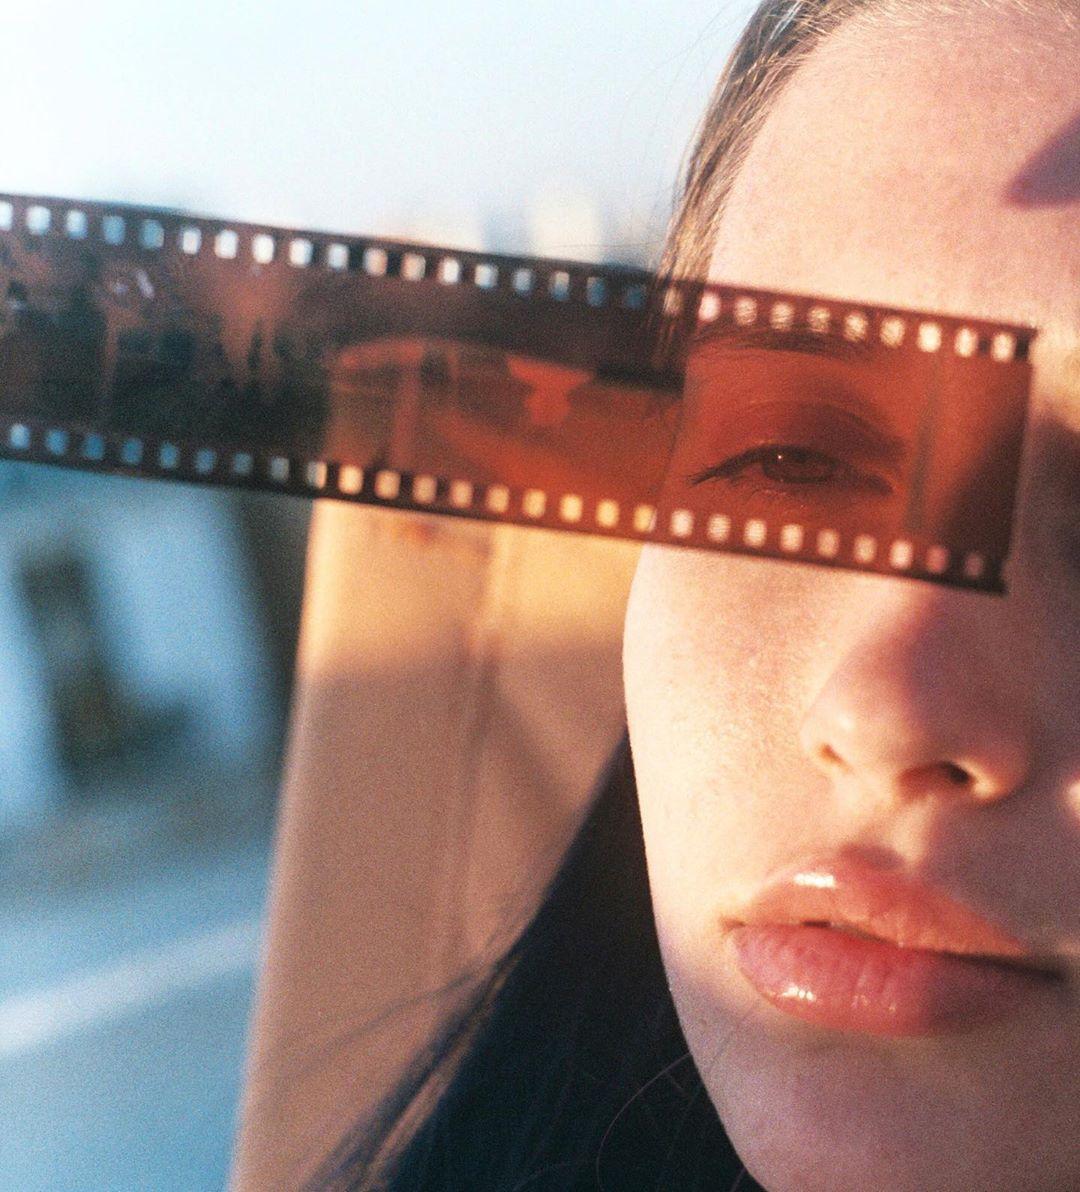 Яичница или омлет? . . . . . . #broadmag #rentalmag #film #35mm #kodak #portraitfotography #kodakportra #portrait #verybusymag…